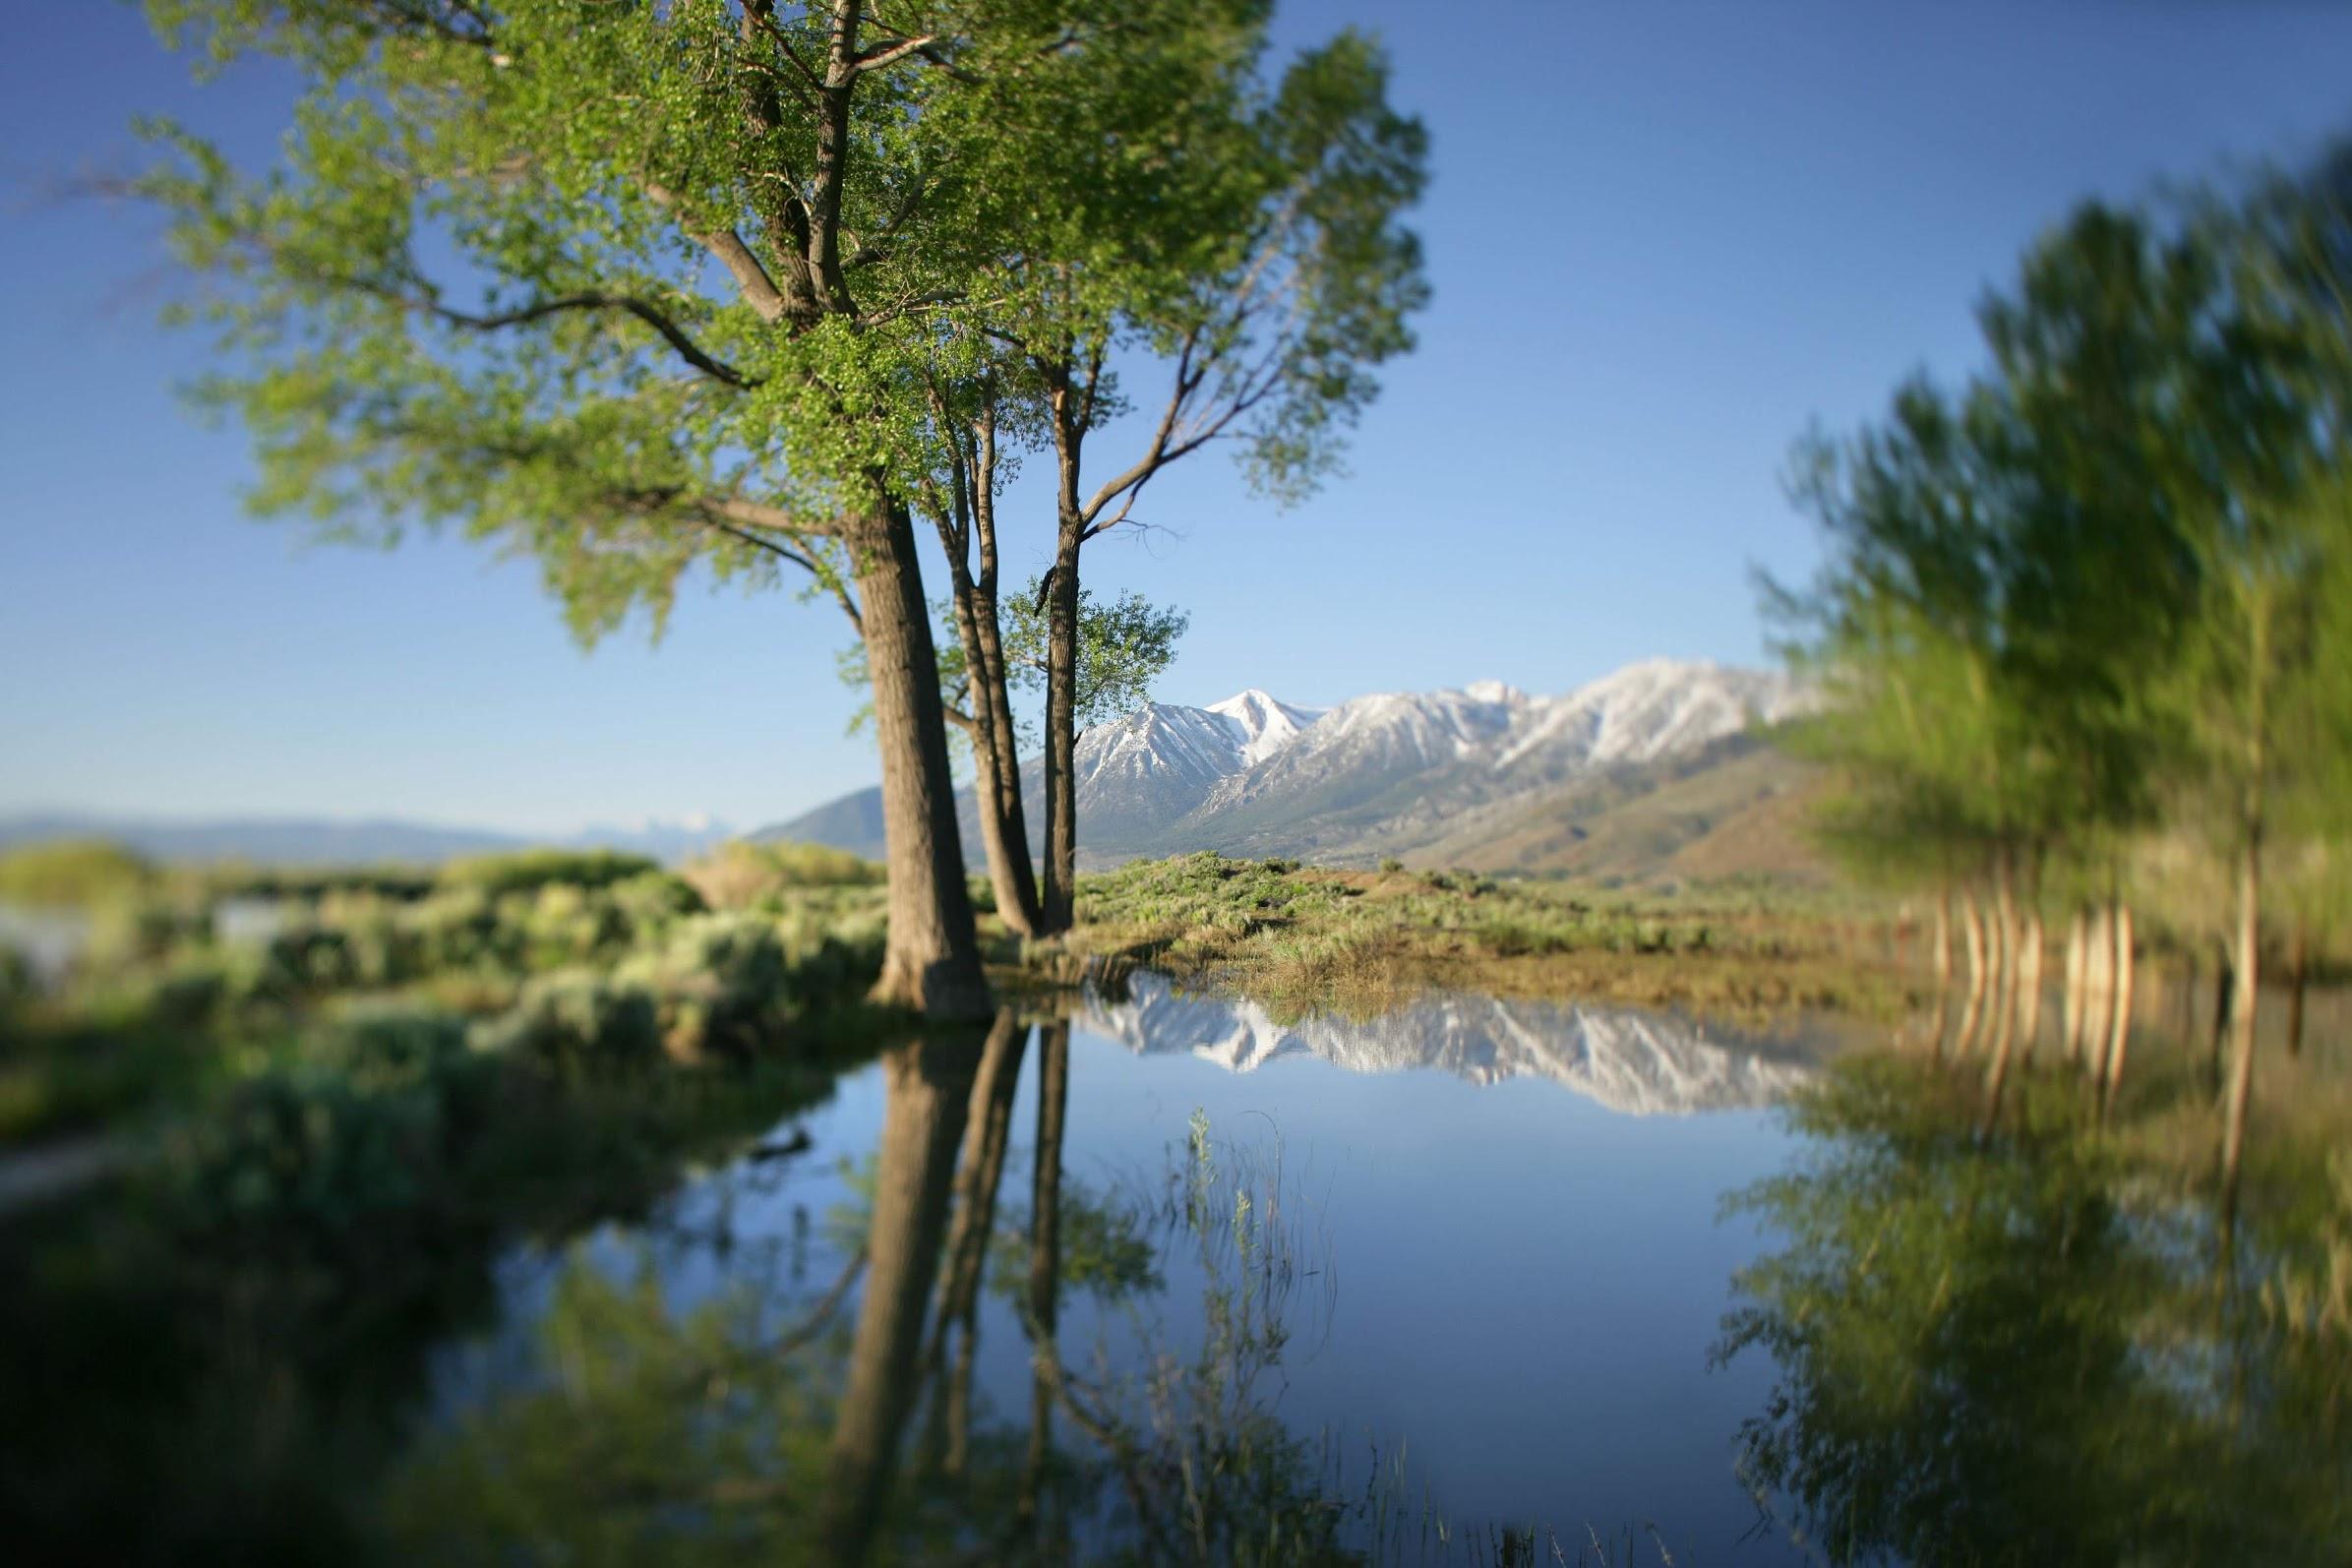 100_0372washoe vally landscape.jpg